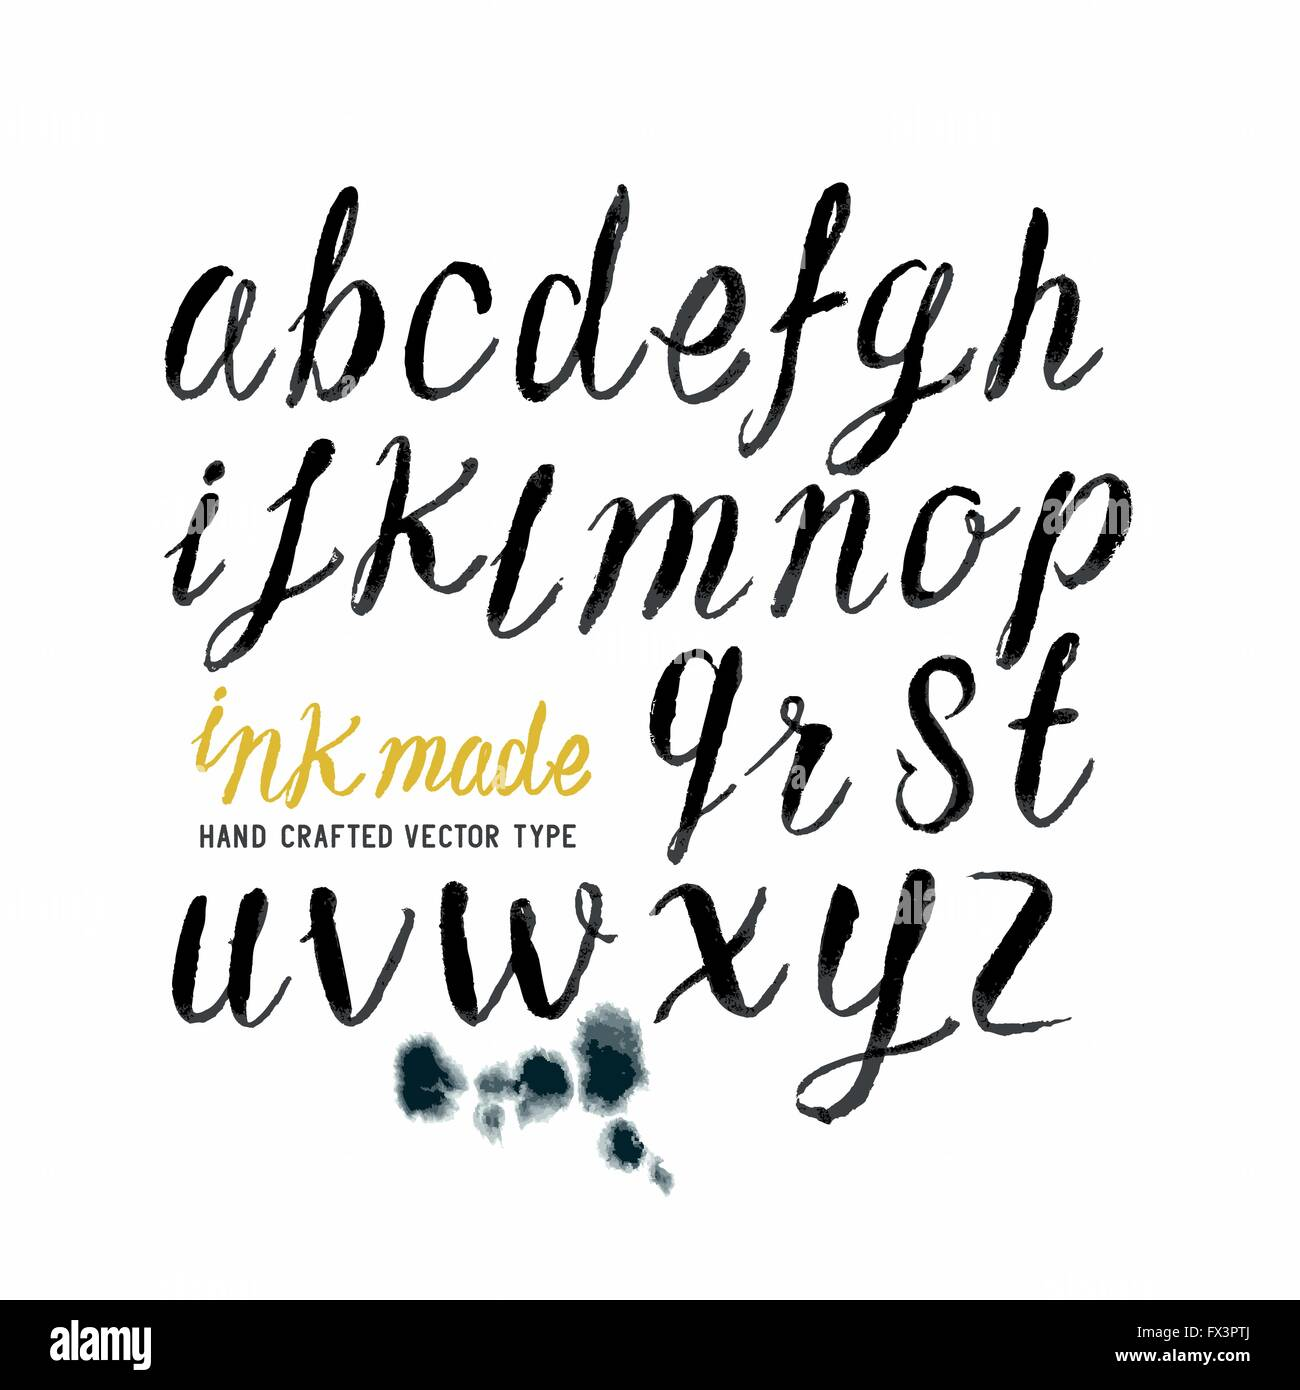 Black Ink Brush Letters. Hand made Alphabet lettering in brushed ink. Vector illustration. - Stock Image